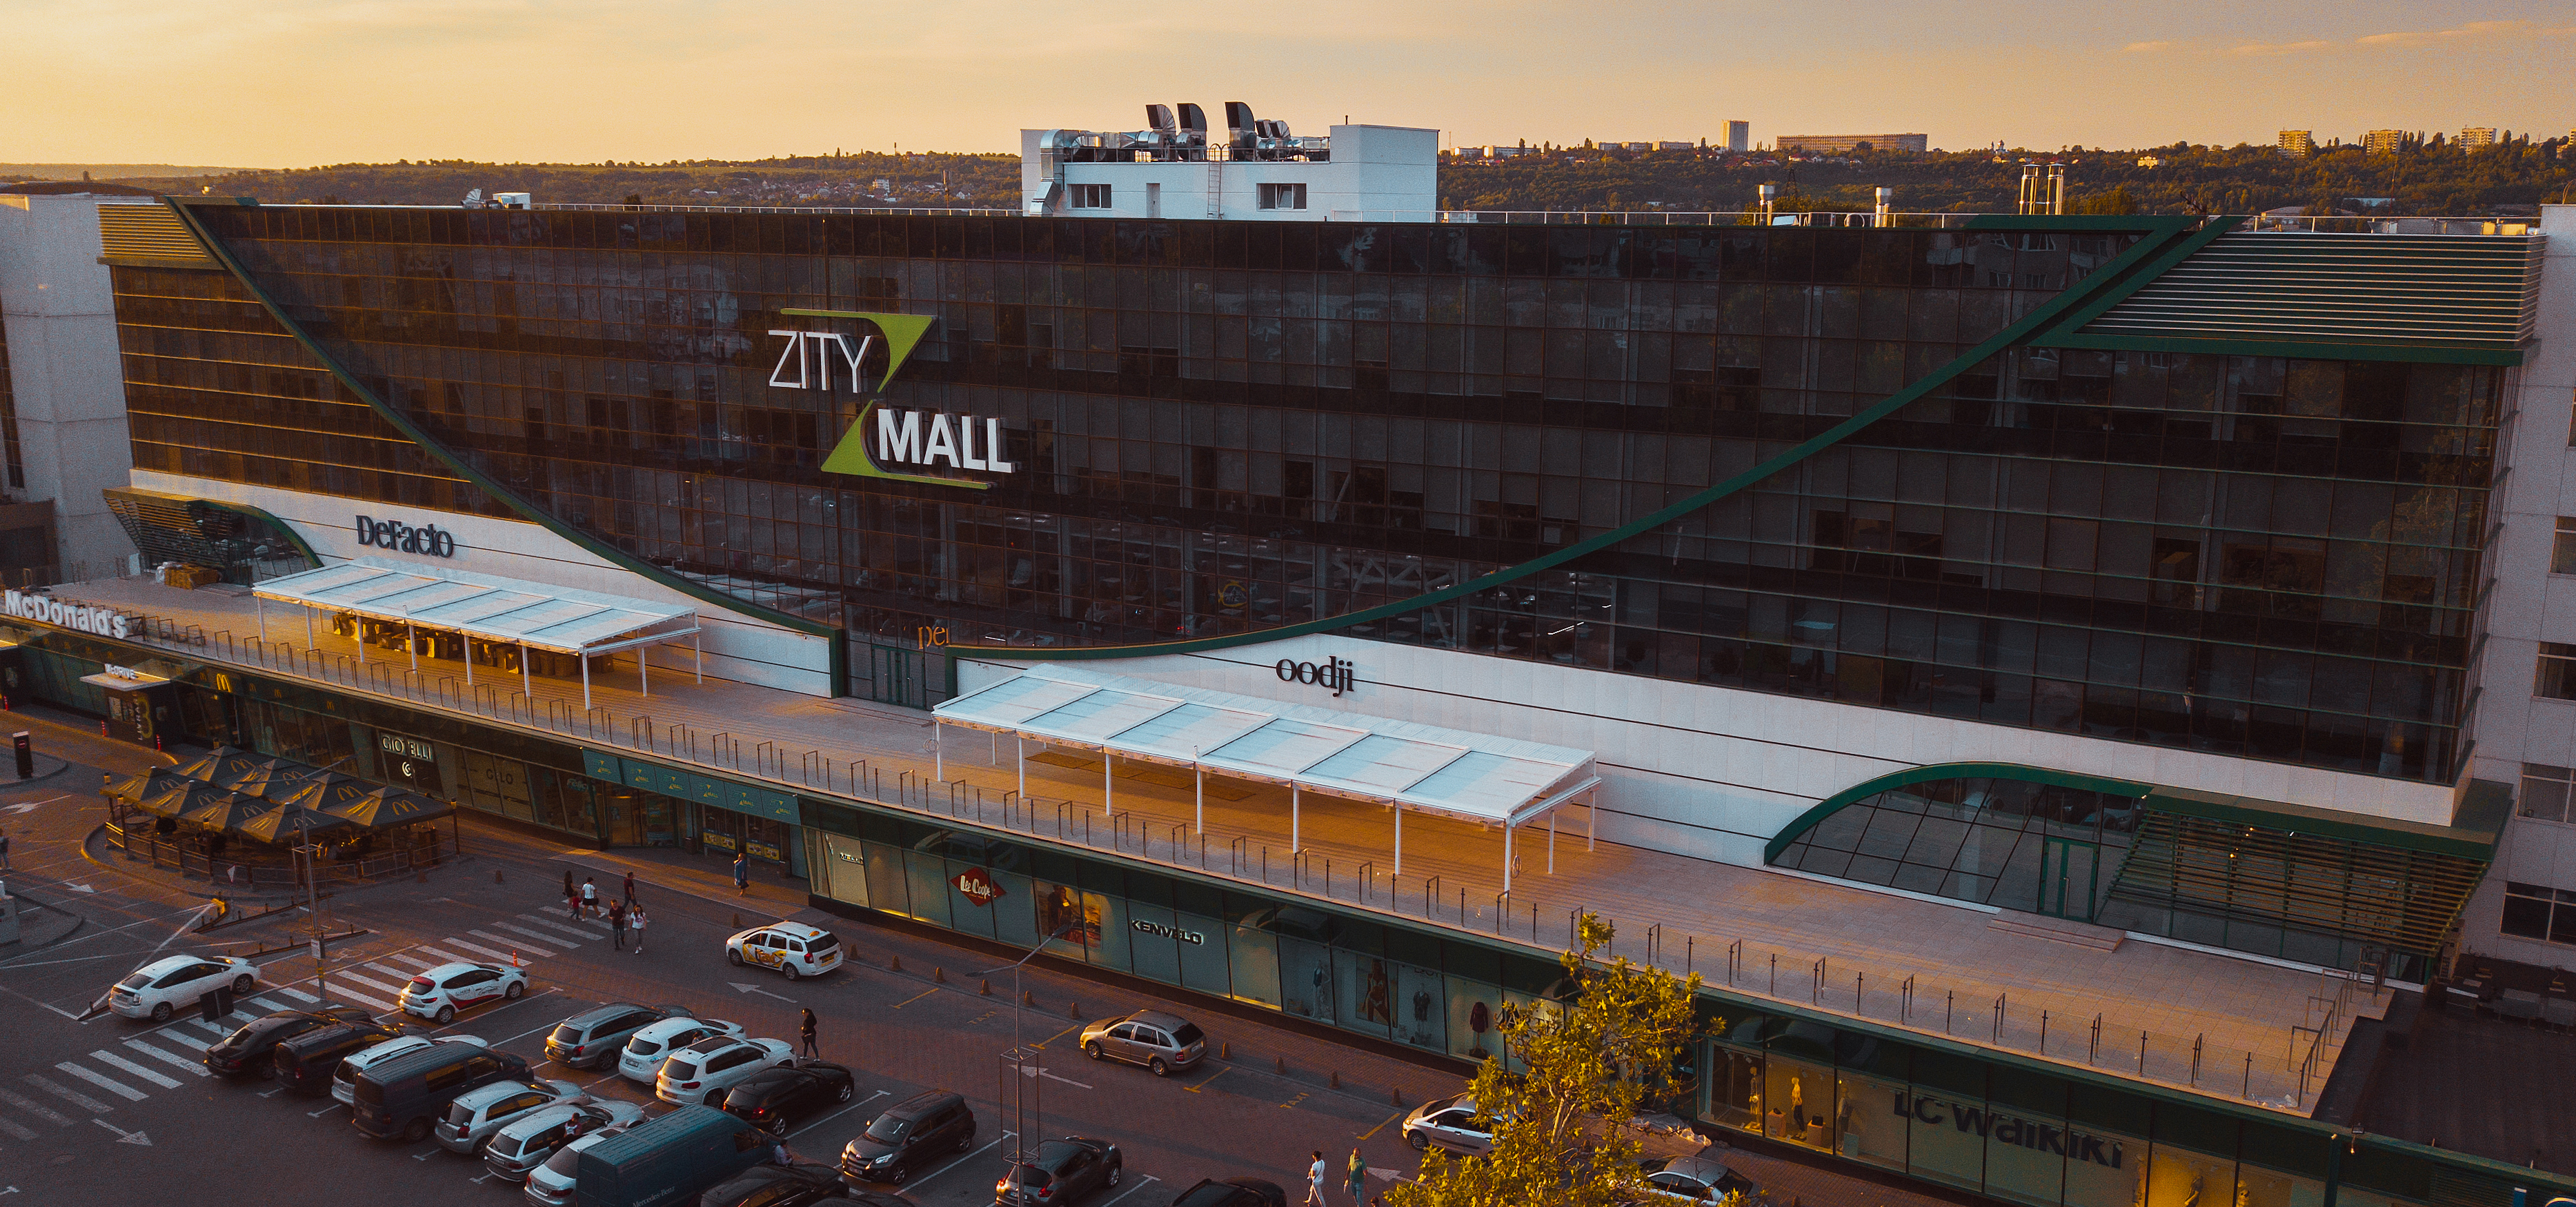 "alt=""zity mall"""